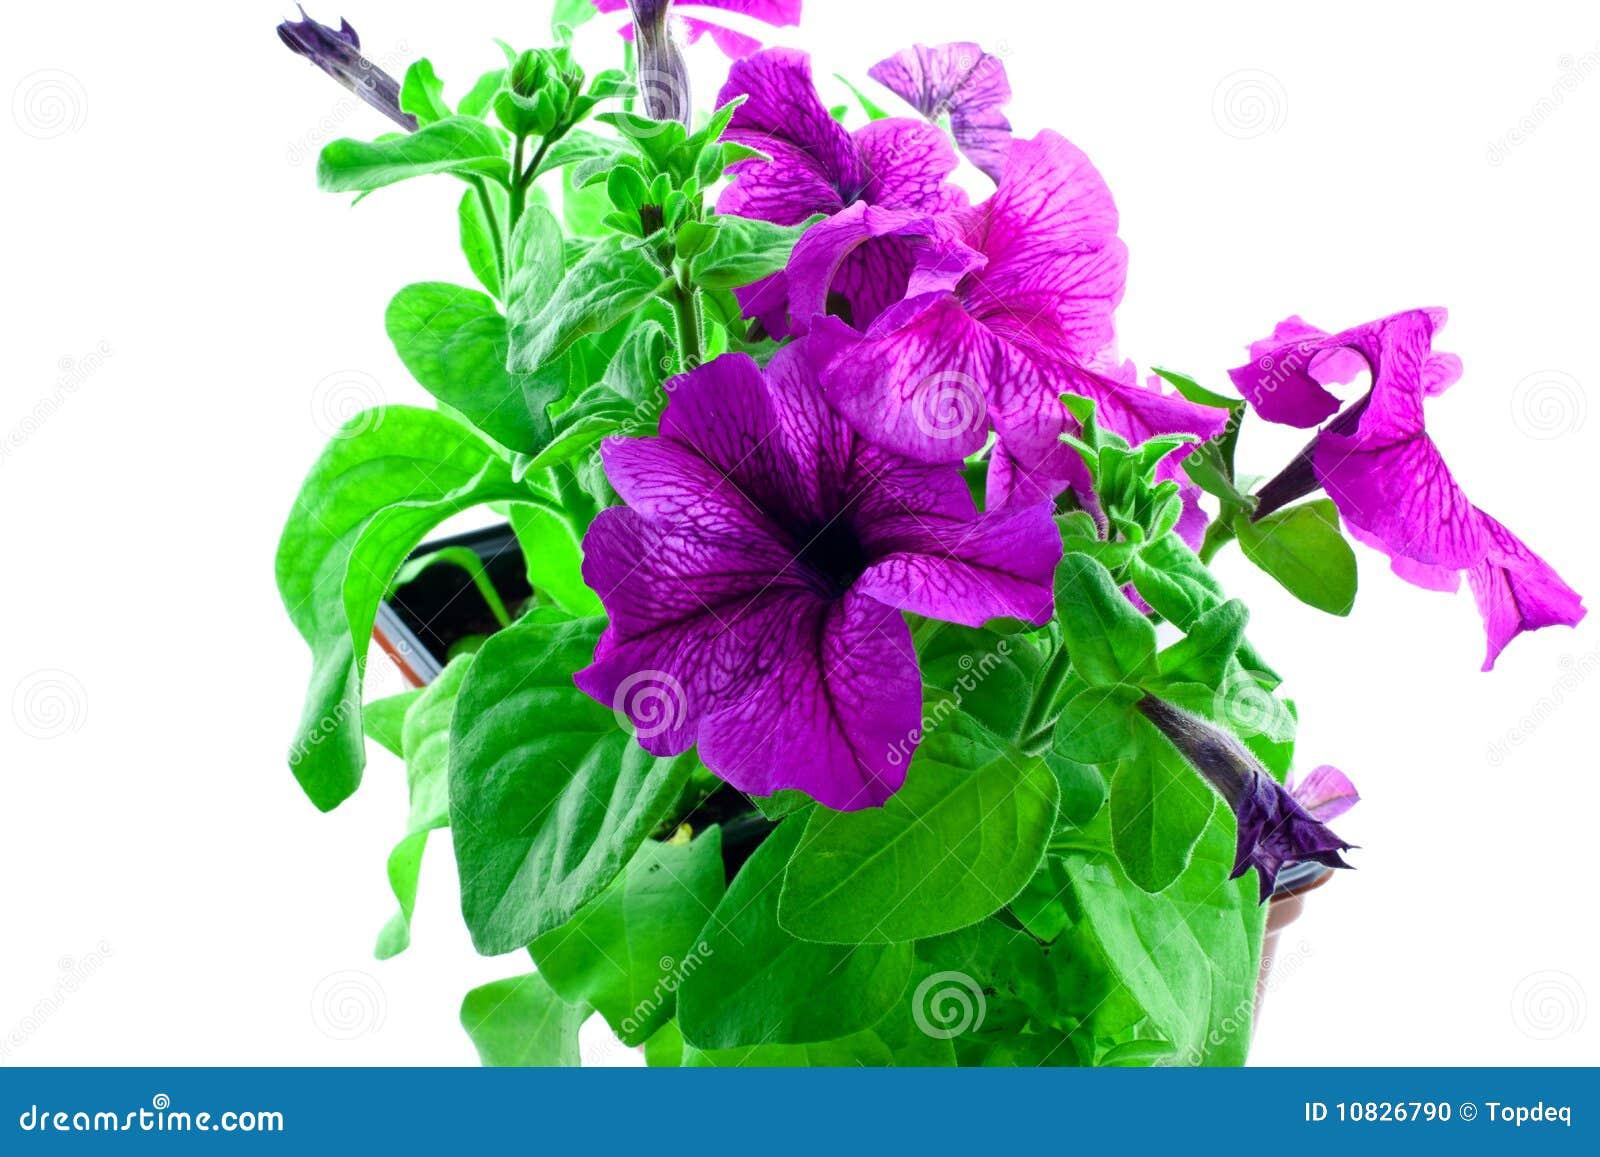 Bright purple petunia in plastic pots